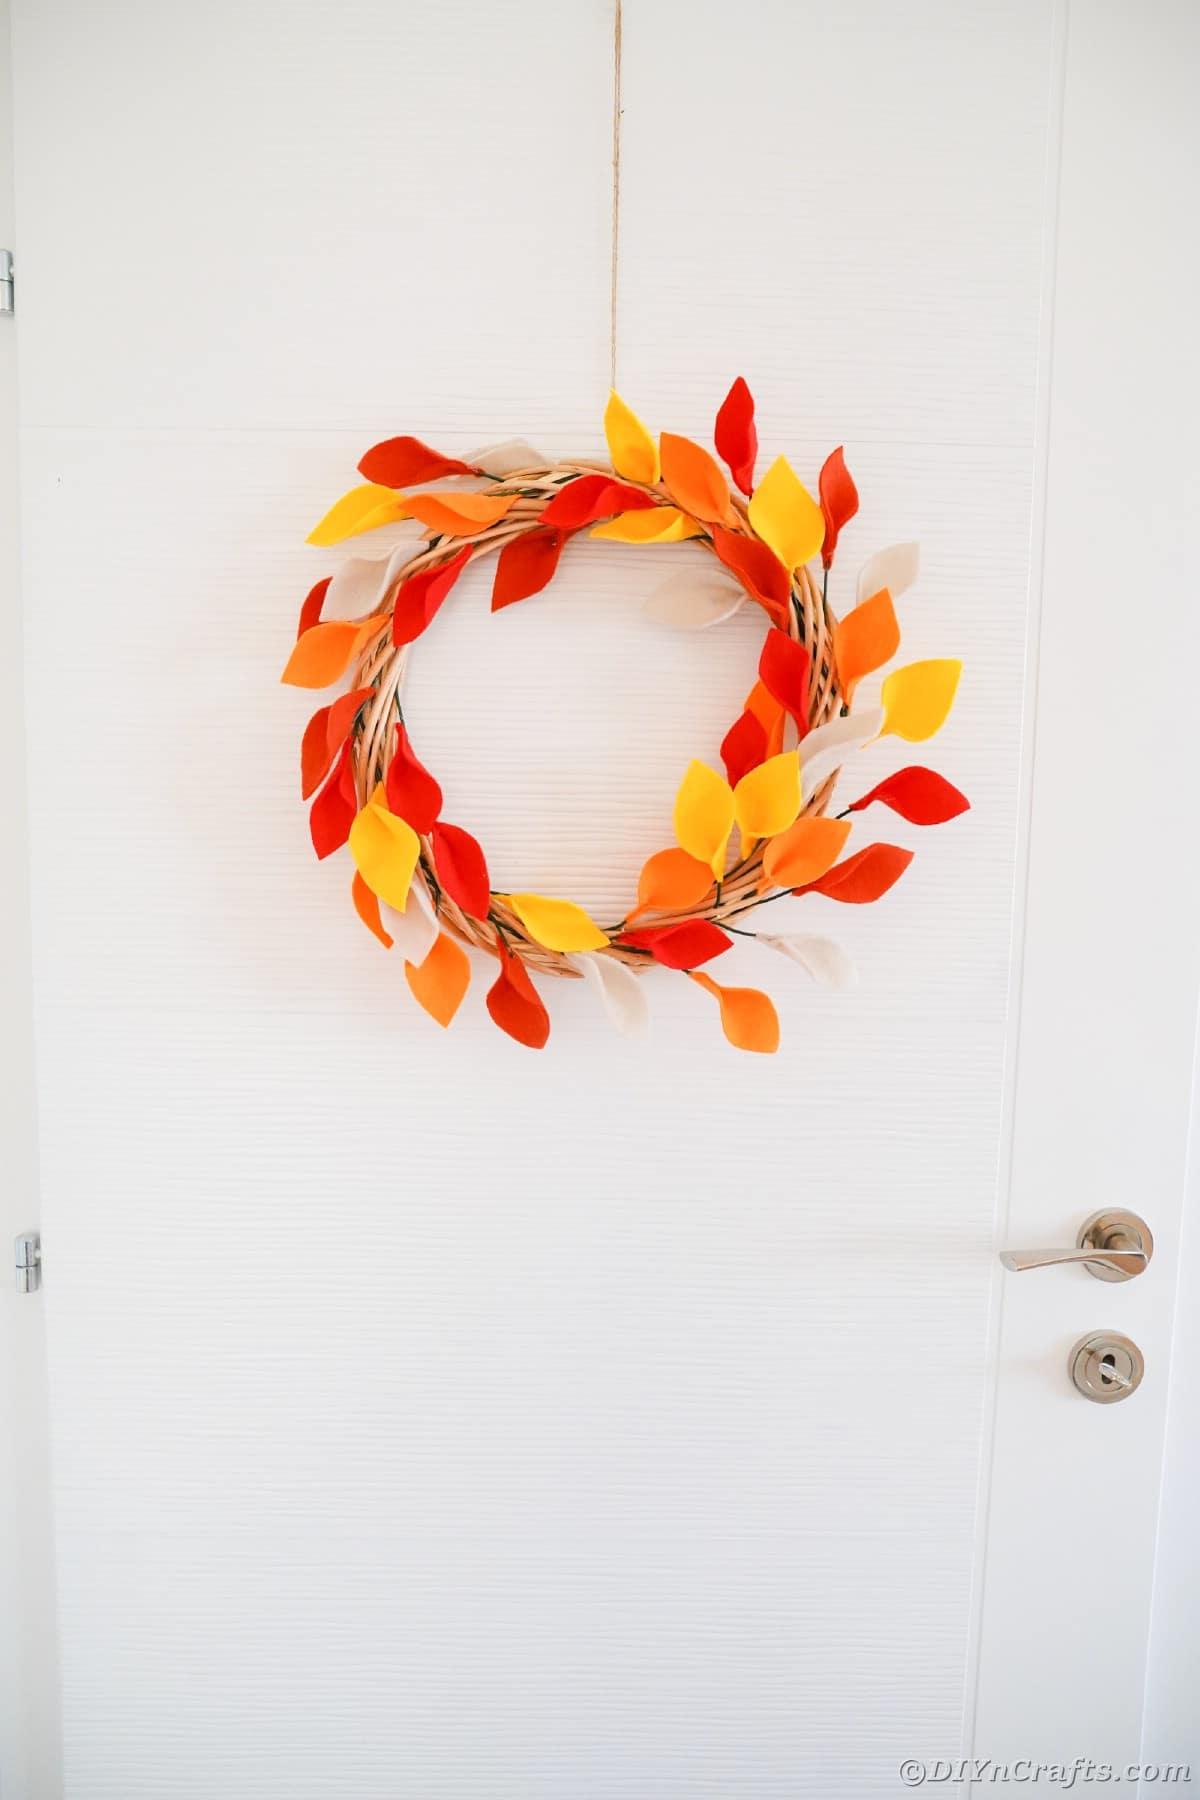 Guirlanda de folhas pendurada na porta branca